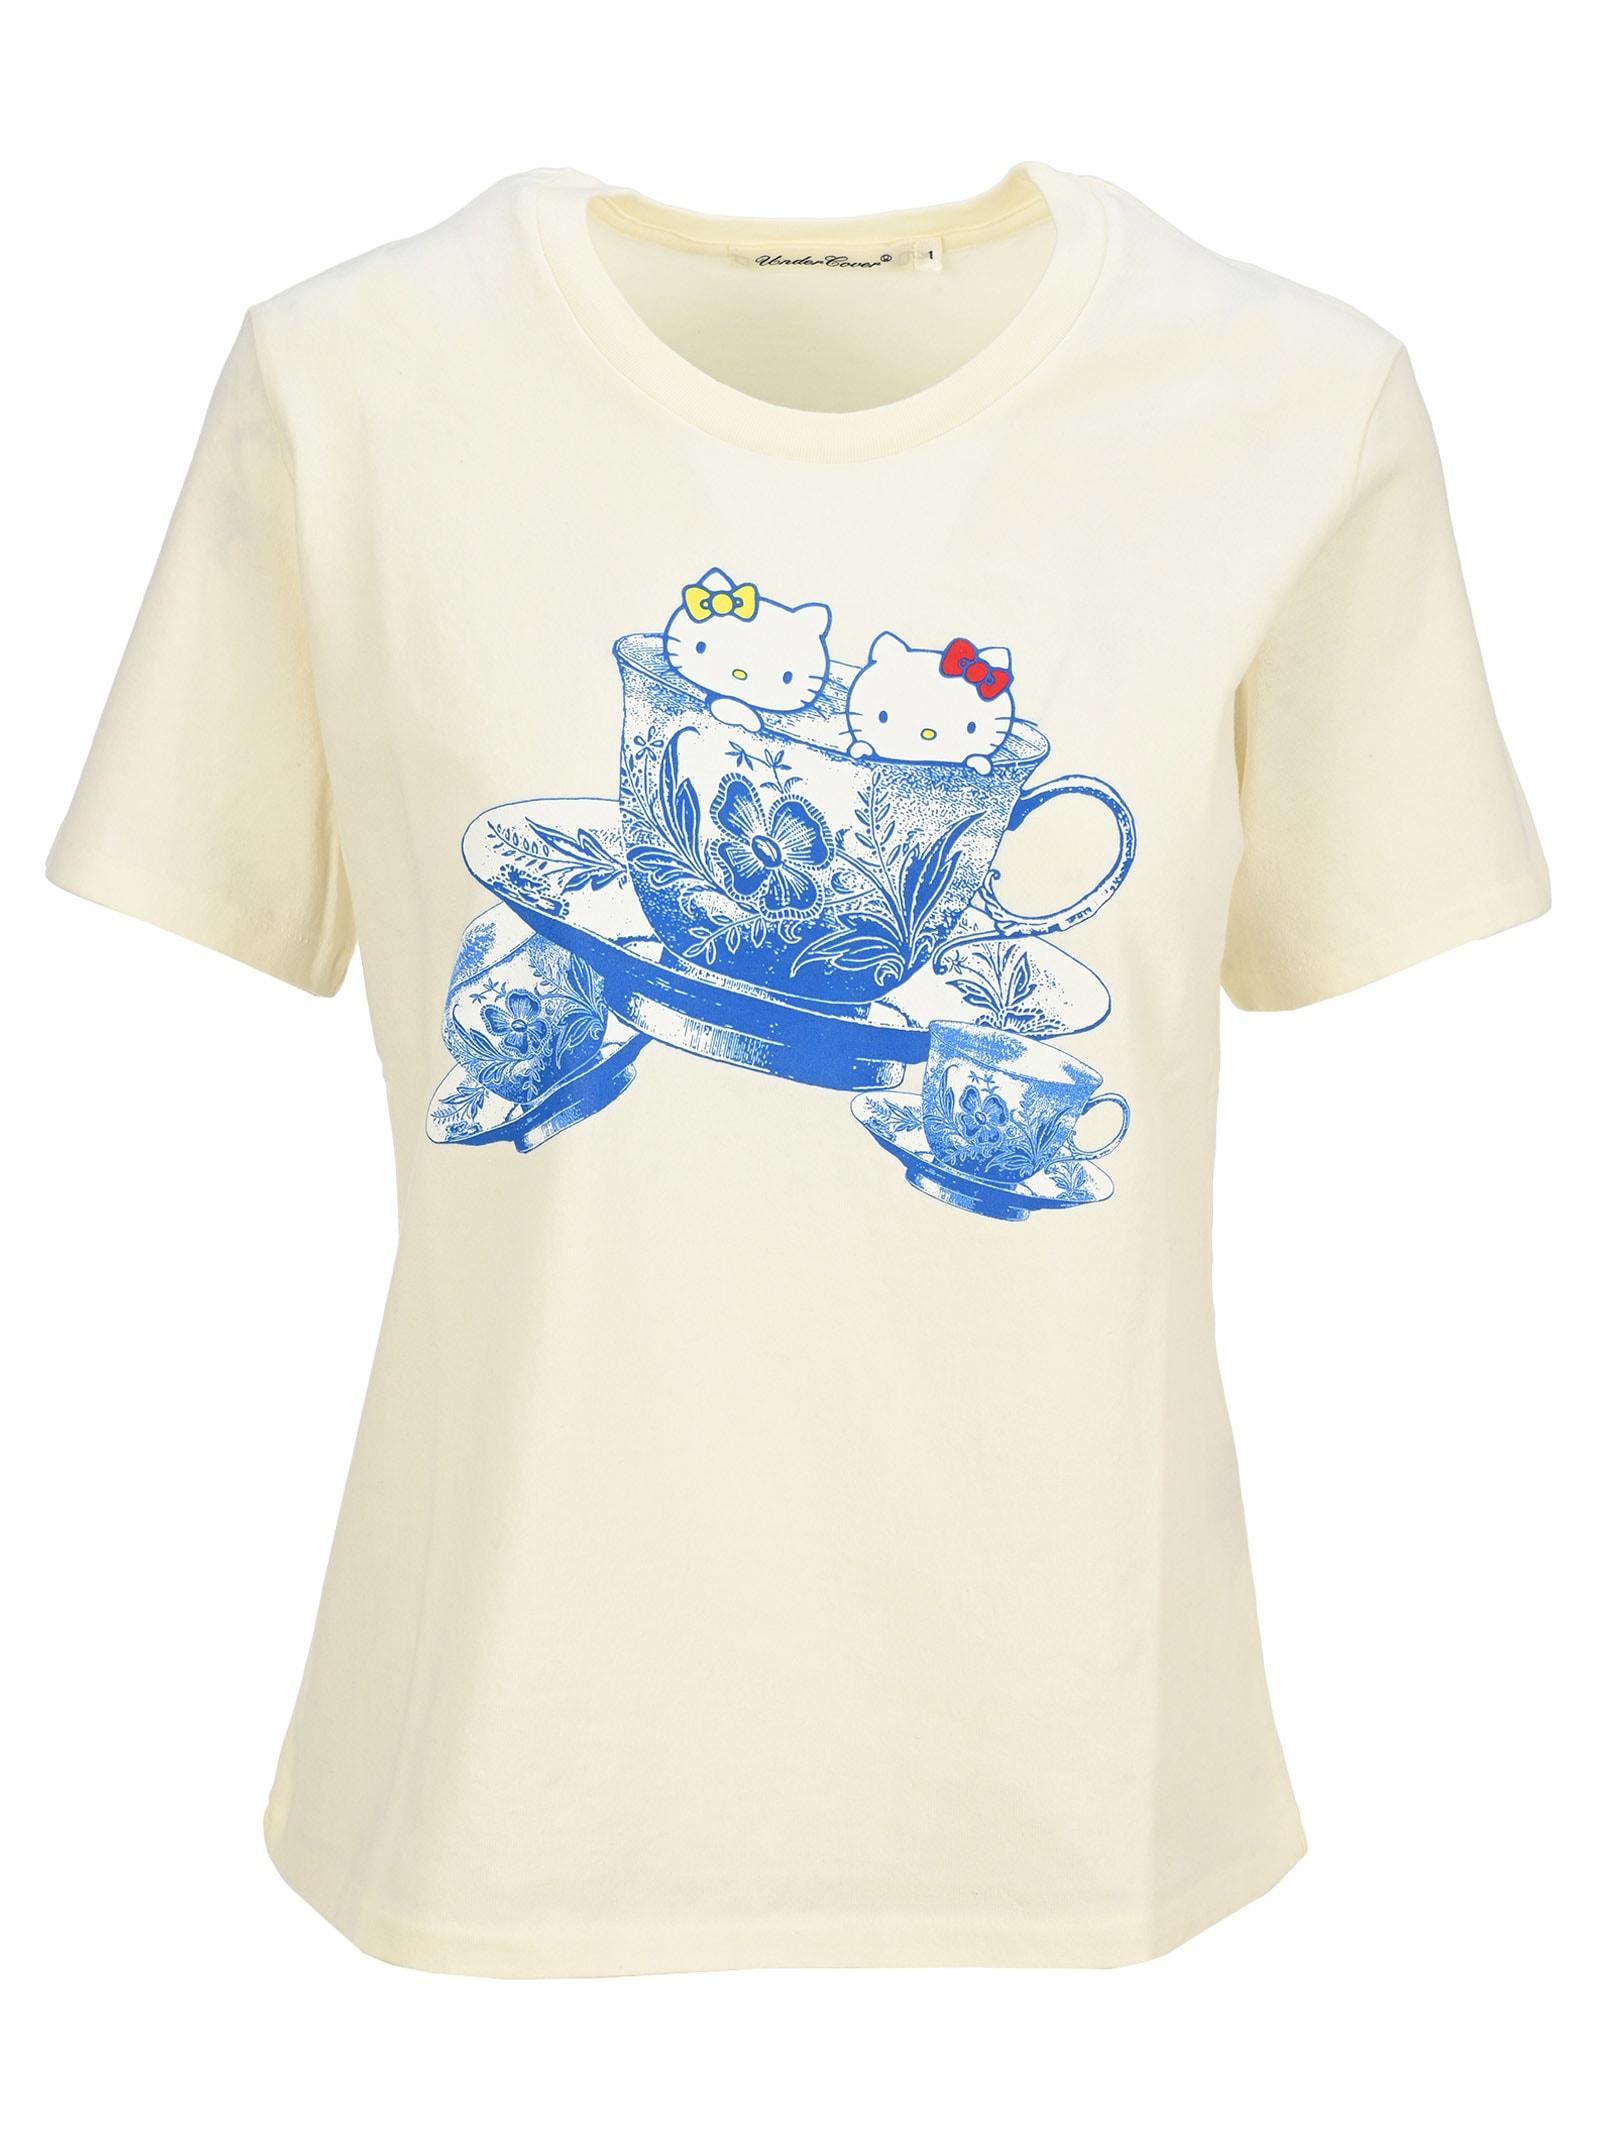 Undercover Jun Takahashi Undercover Hello Kitty Mug-print T-shirt